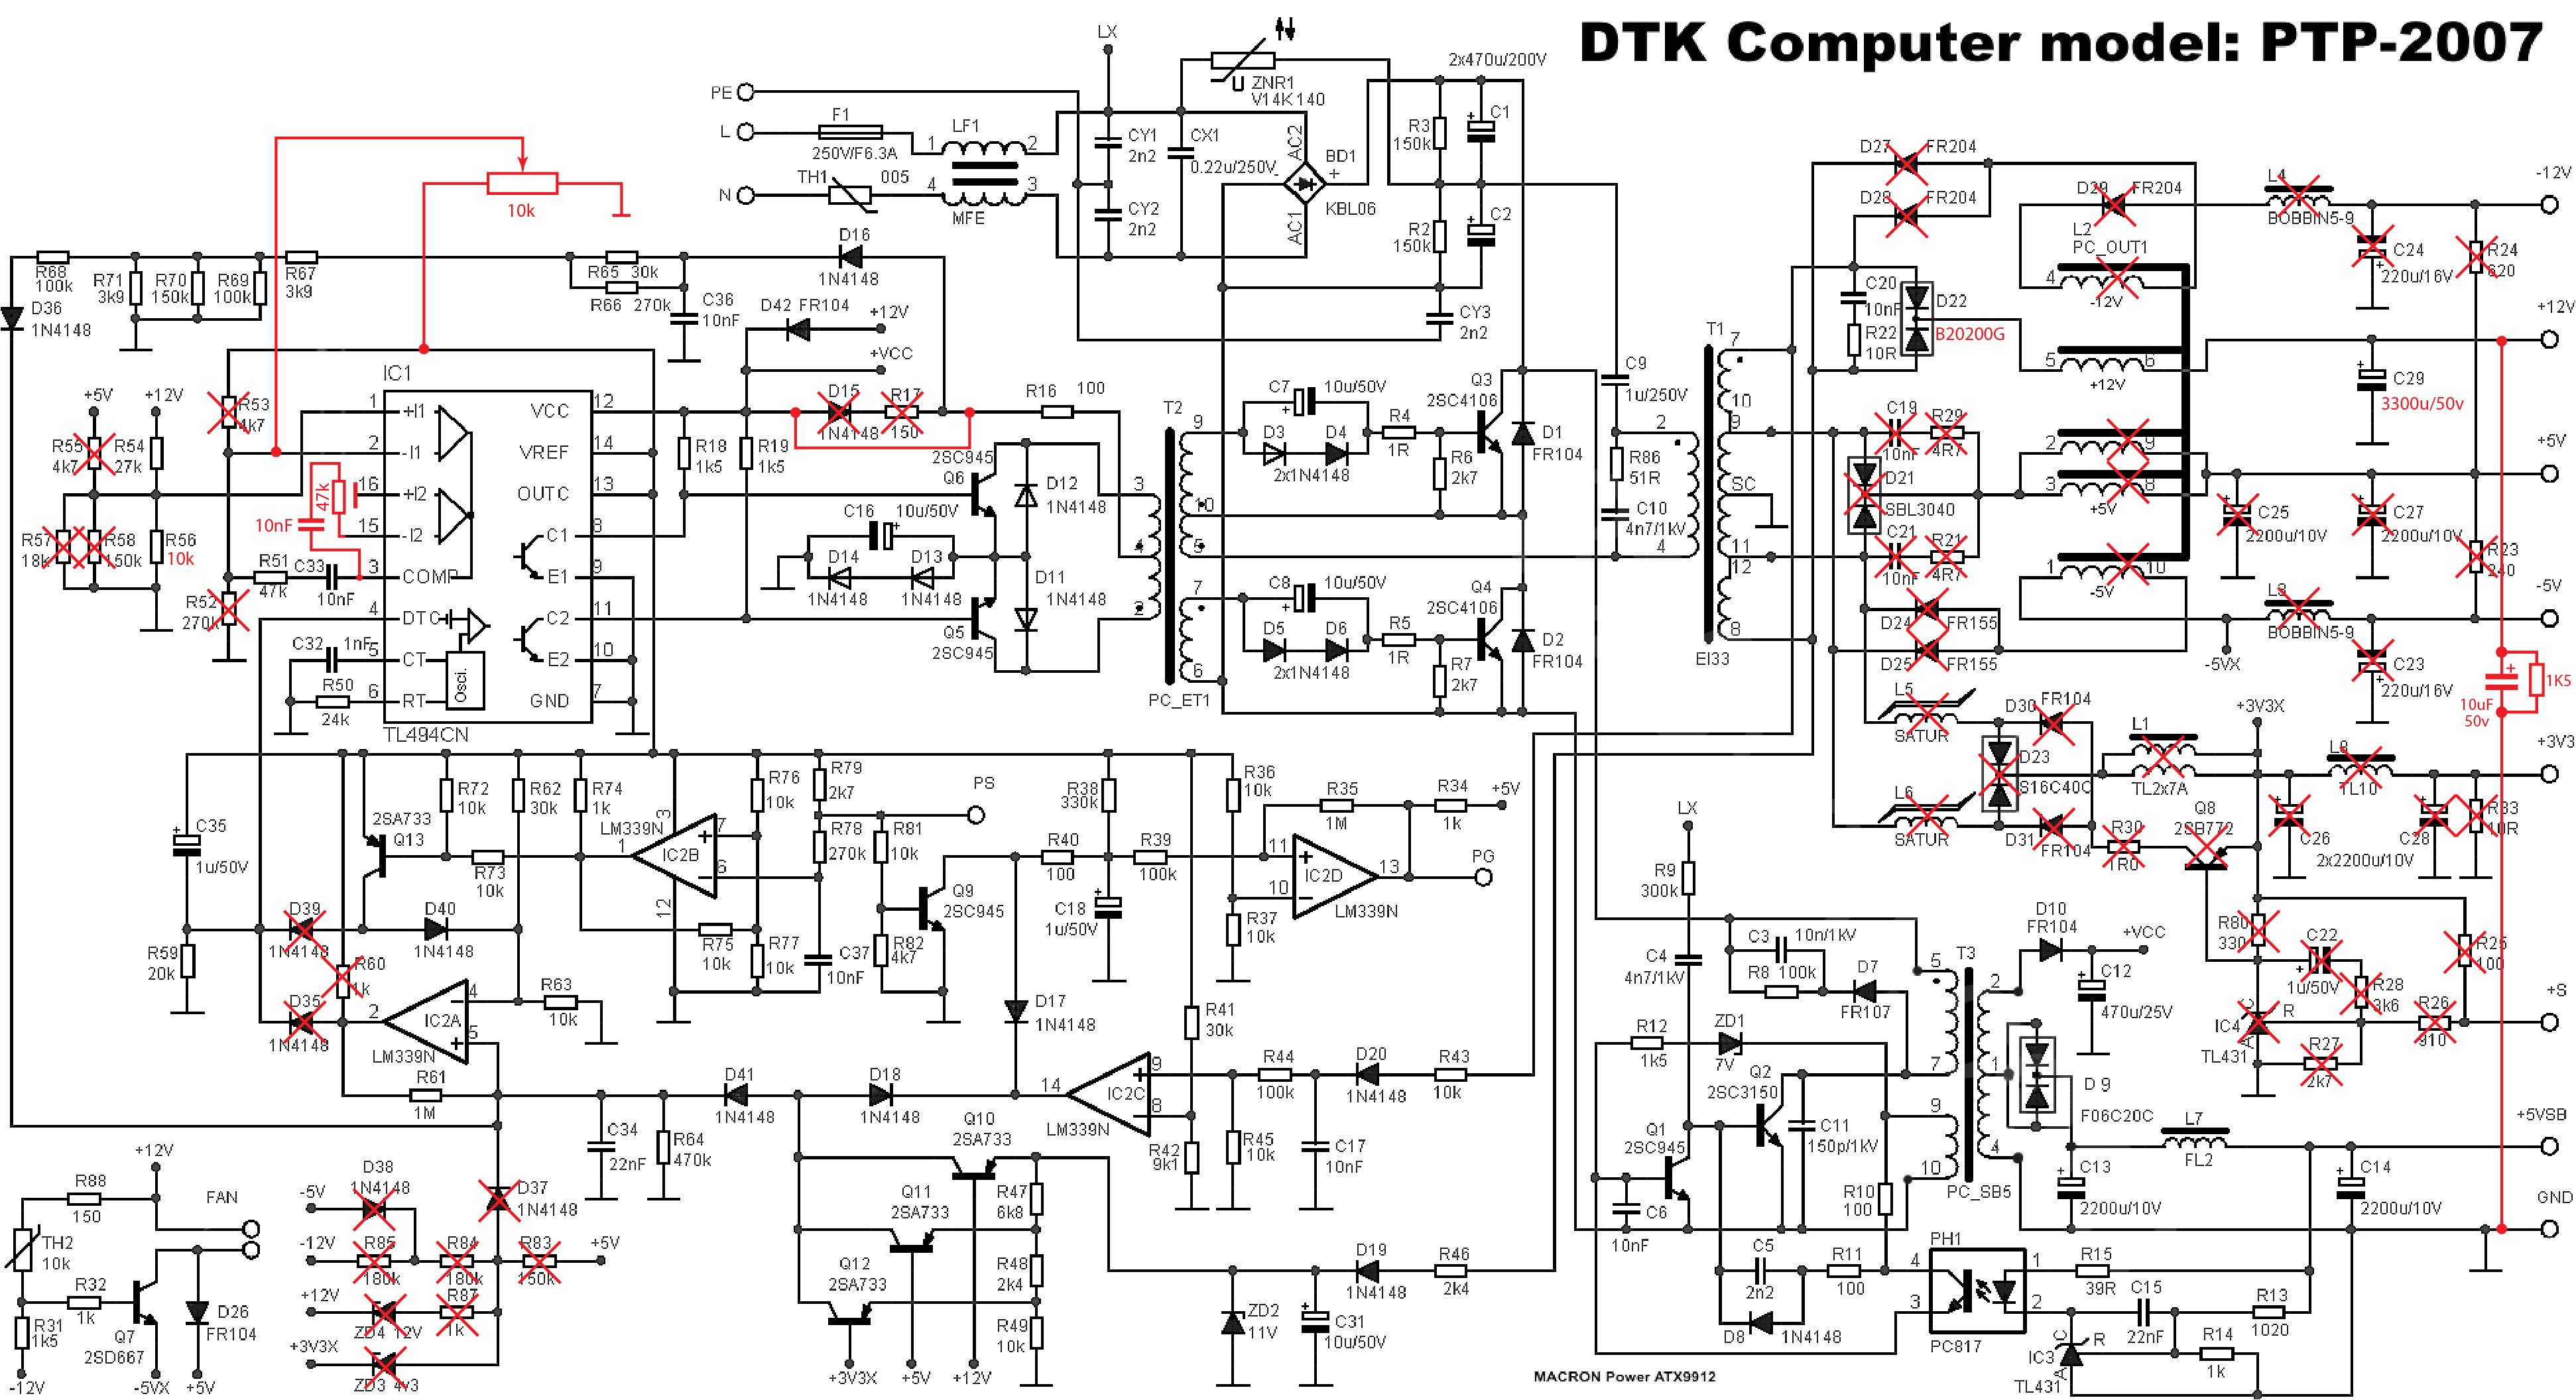 Circuit Diagram Atx Smps Power Supply Image.